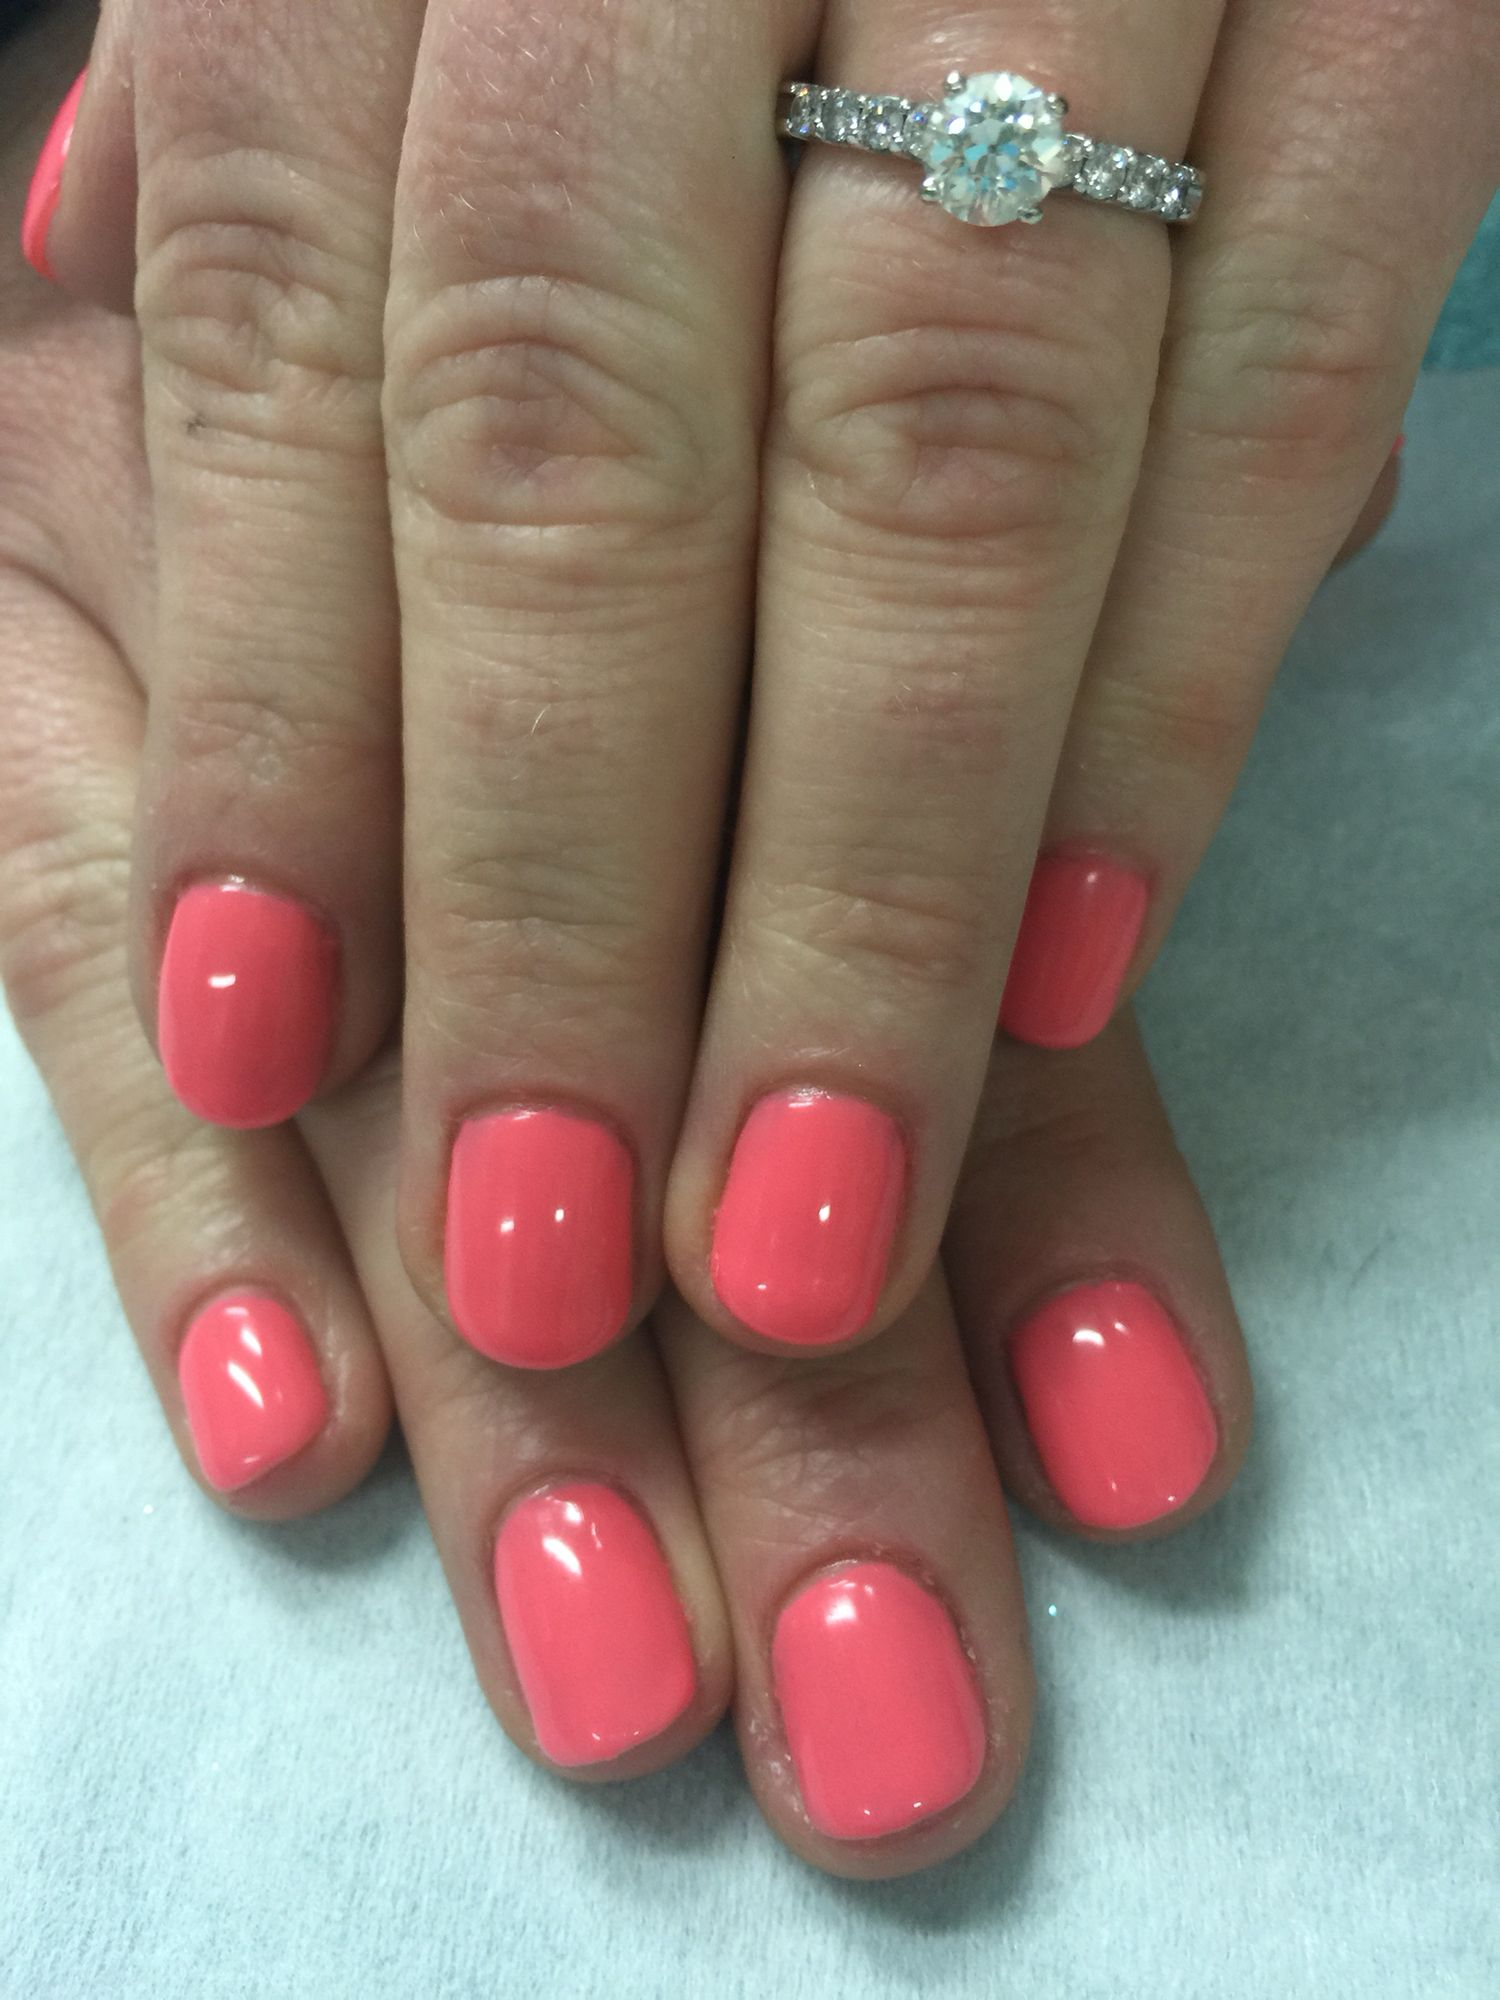 Pink coral spring gel nails | Gel Nail designs | Pinterest